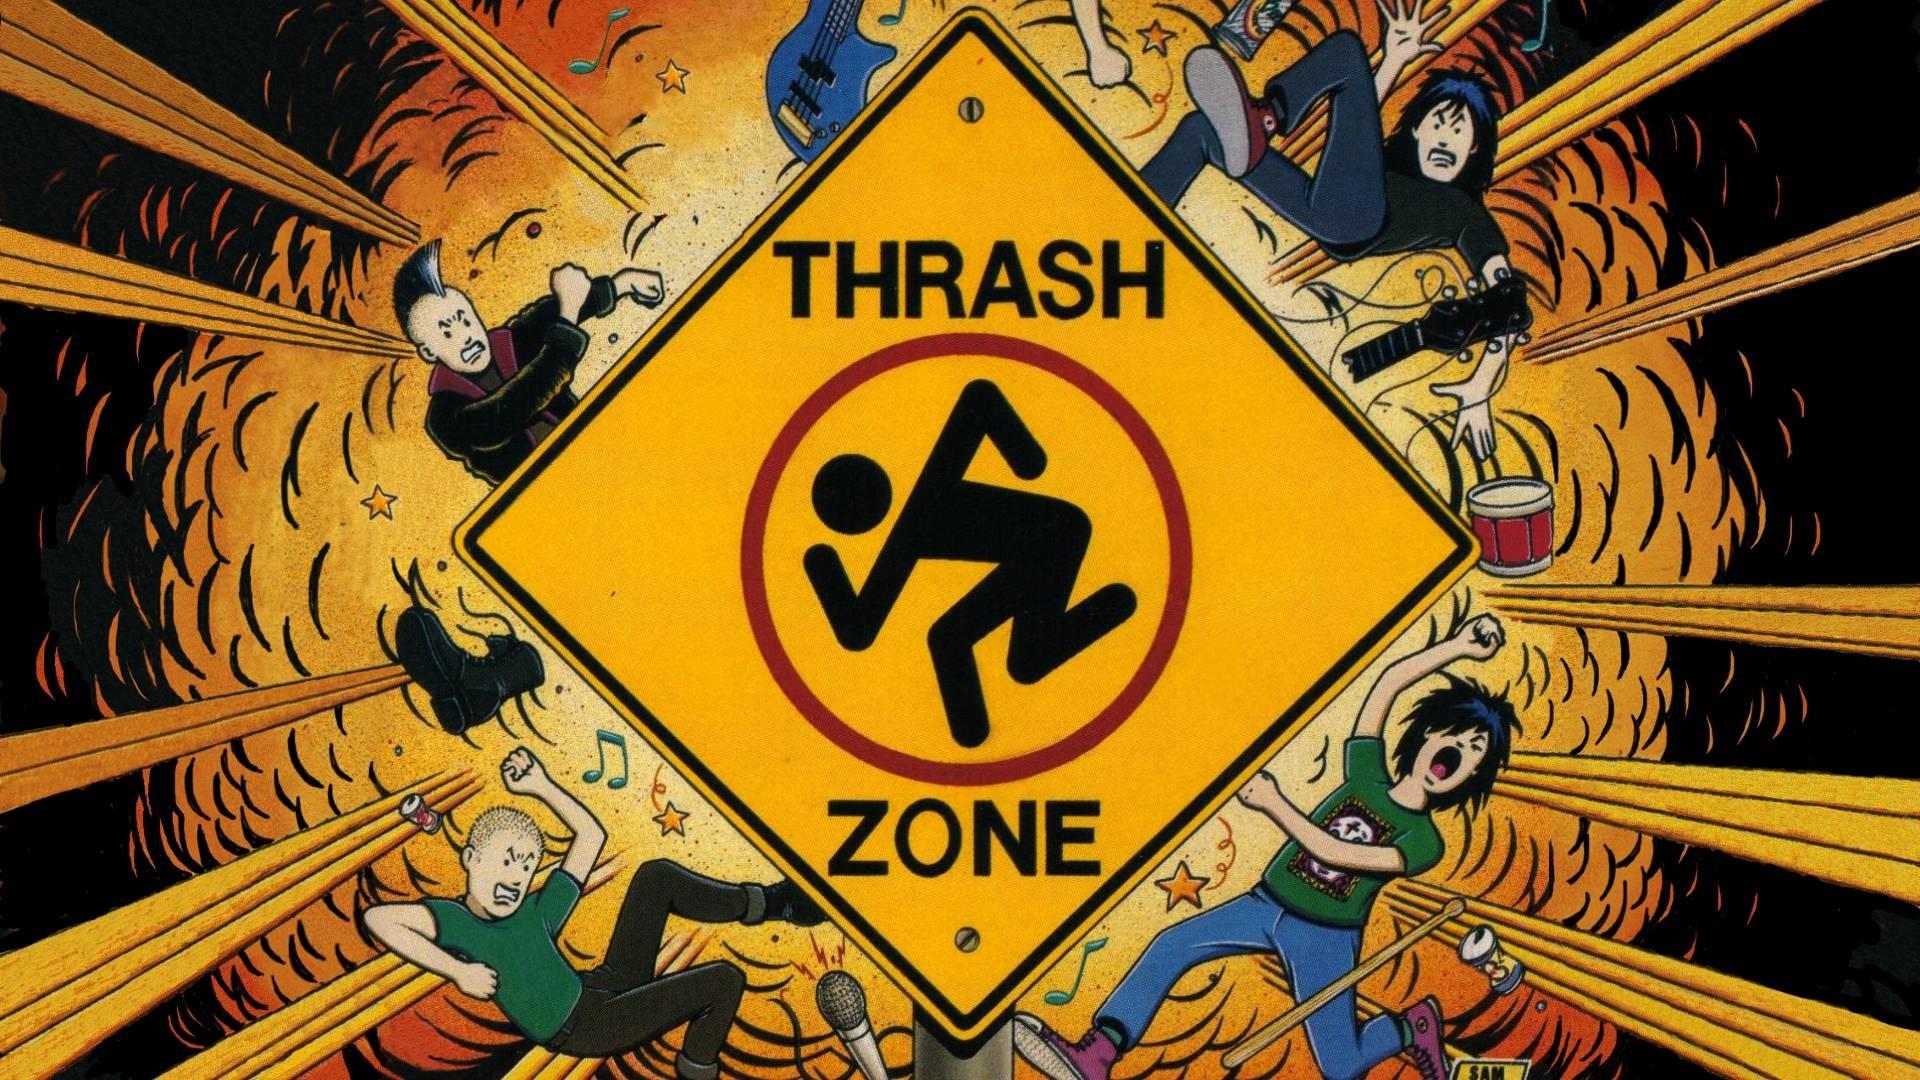 Thrash Zone Wallpaper HD